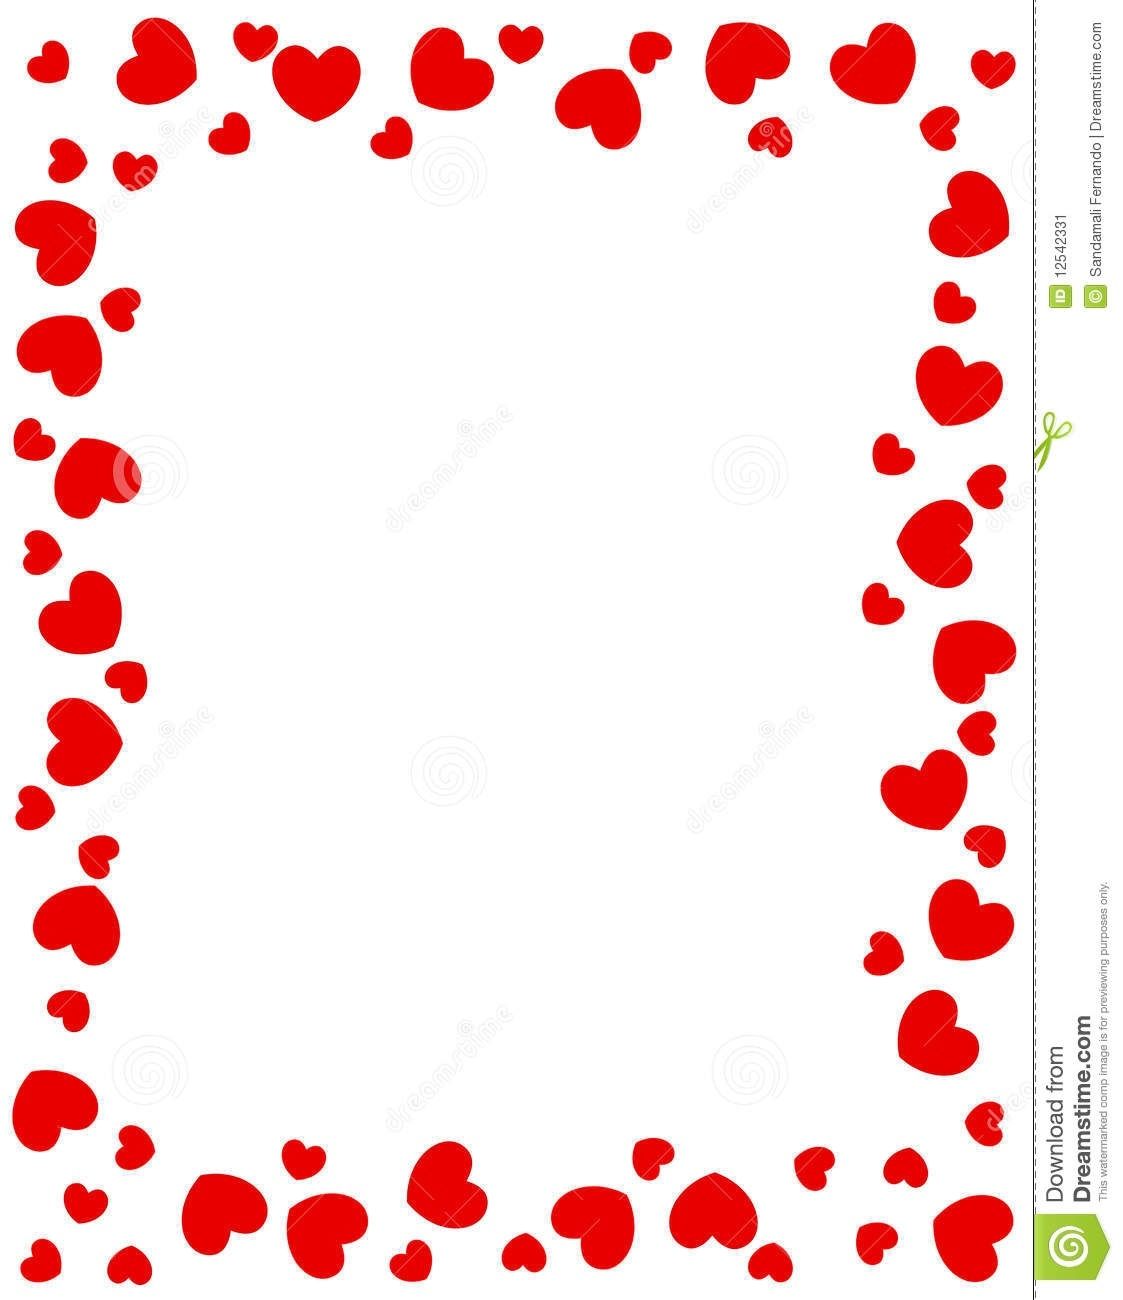 Heart border clipart.